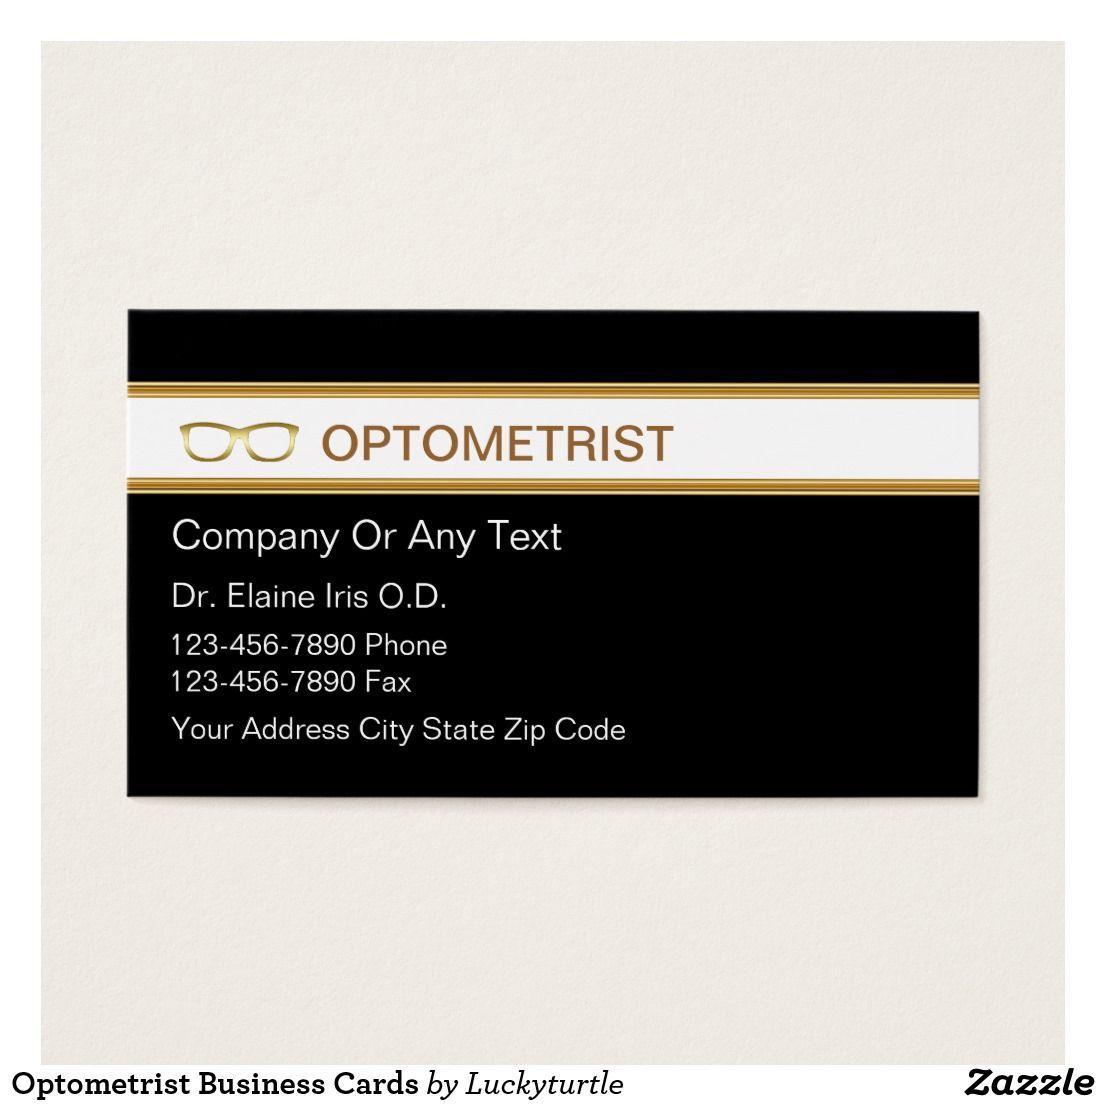 Optometrist Business Cards | Pinterest